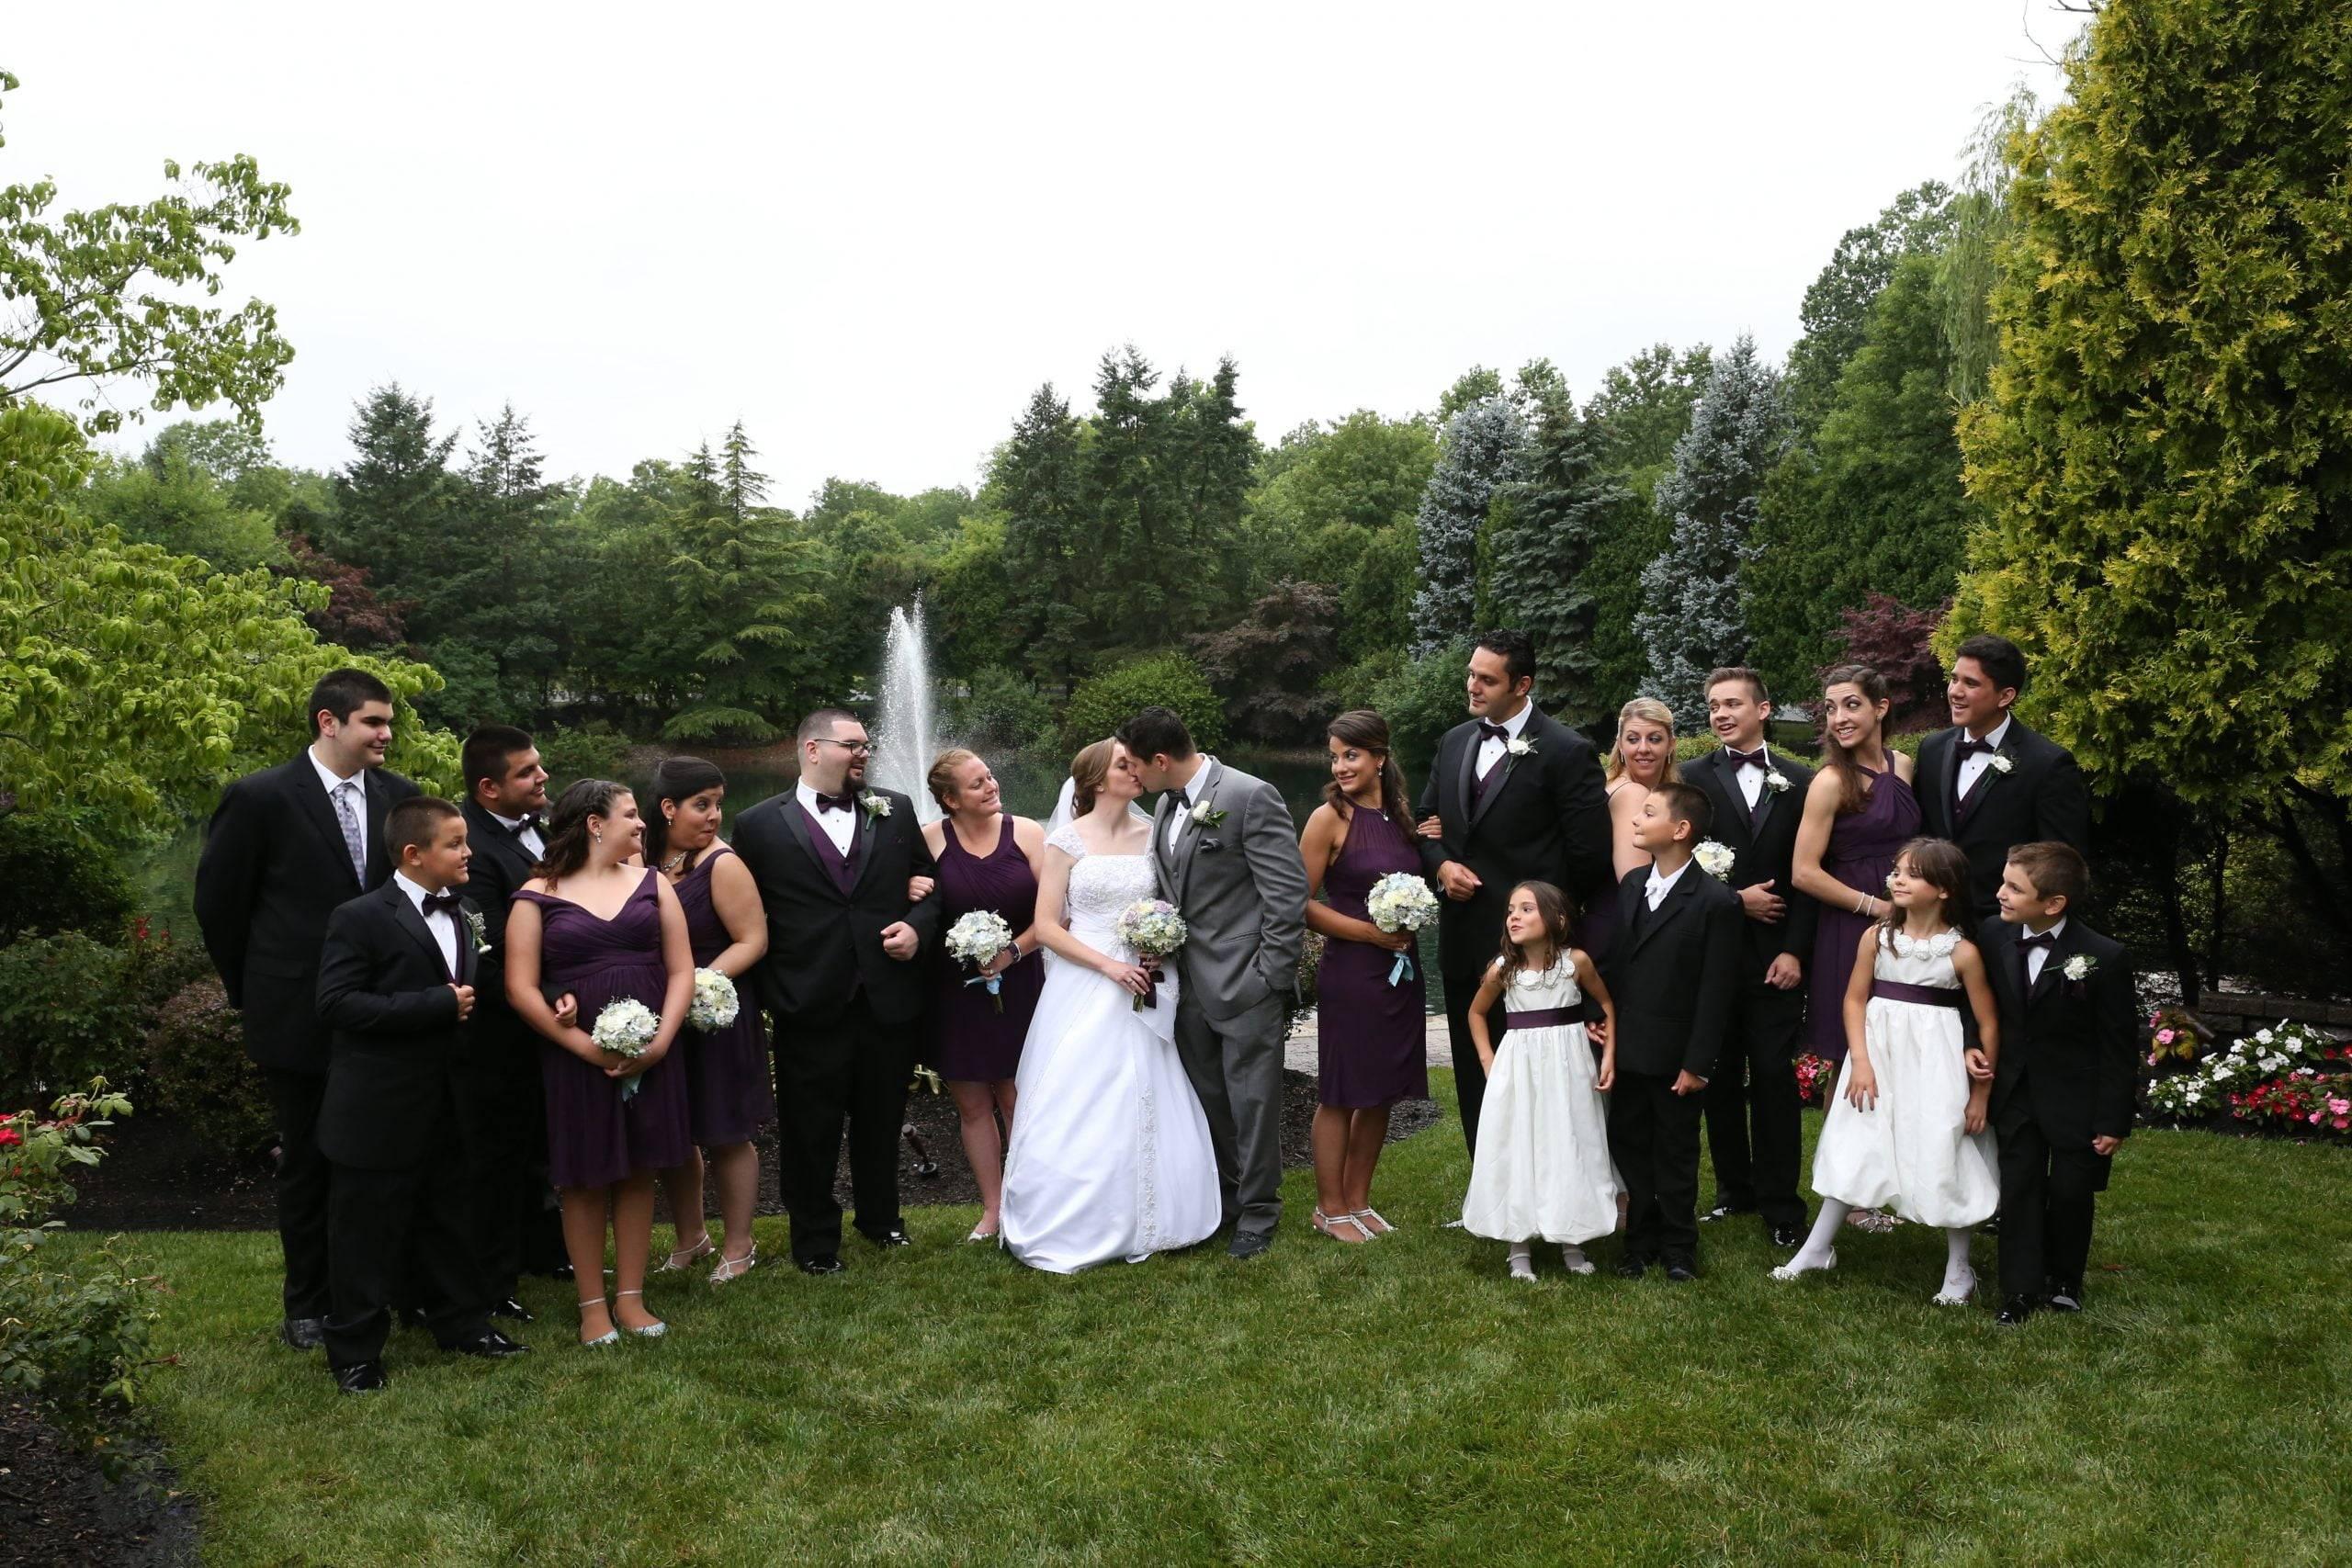 Bridgewater Manor wedding party by fountain